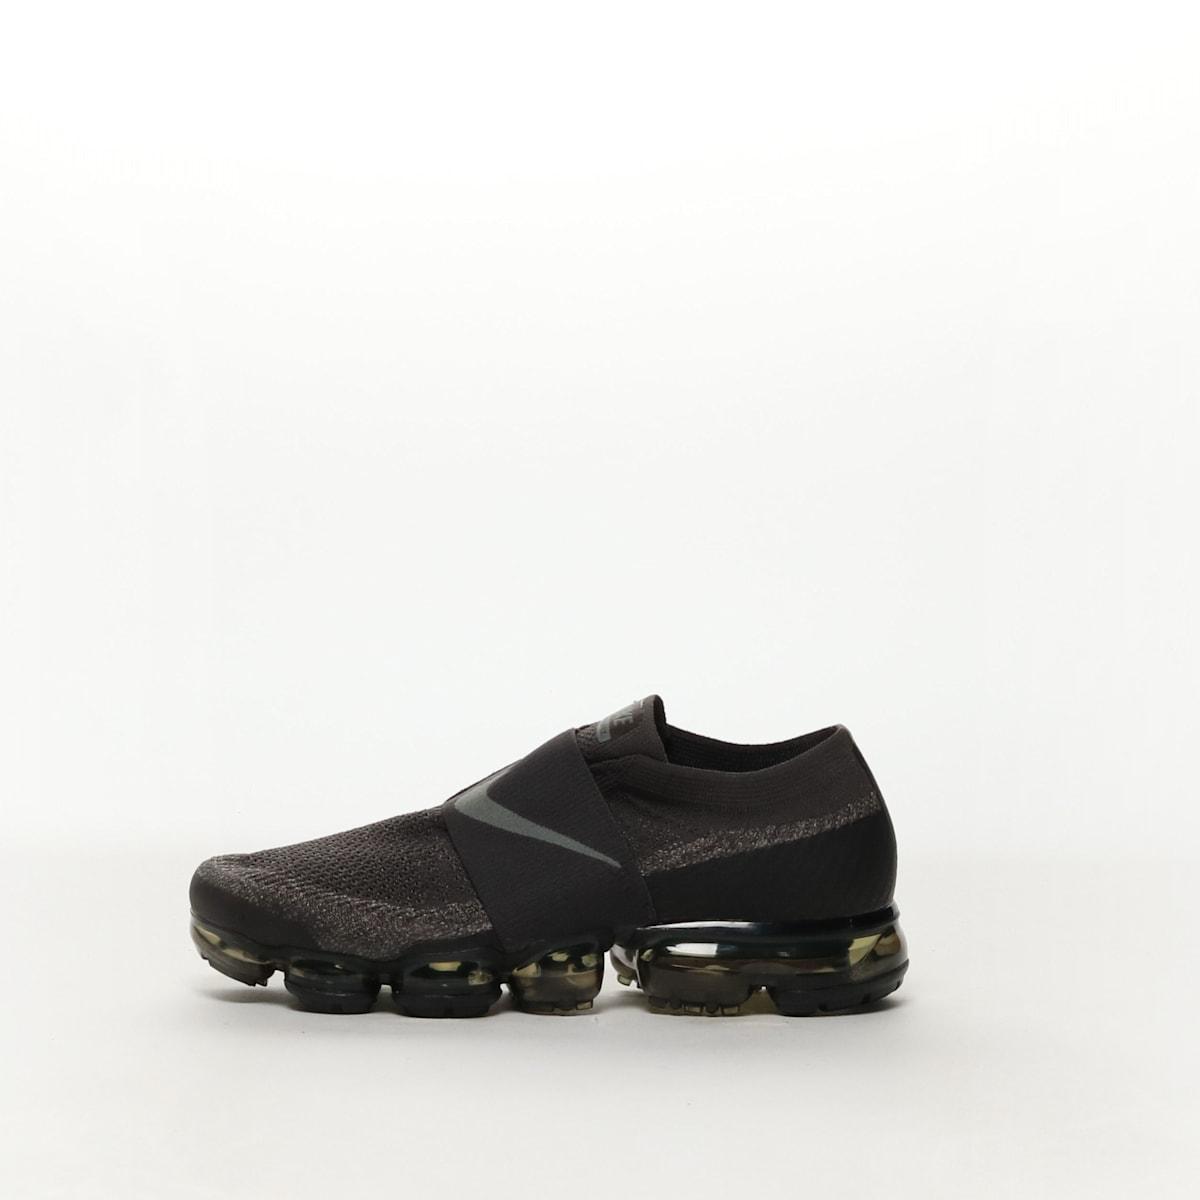 37df81eb9b Men's Nike Air VaporMax Flyknit MOC Running Shoe - MIDNIGHT FOG/DARK ...